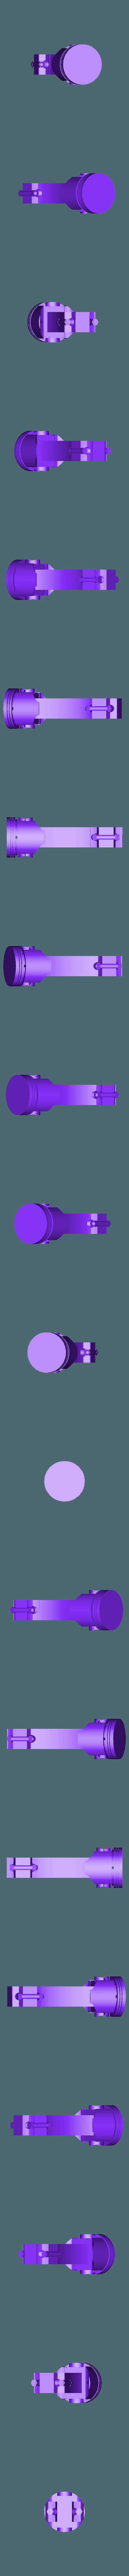 Piston ~ Brut.stl Download free STL file Decorative Piston • Object to 3D print, LuliasMartch